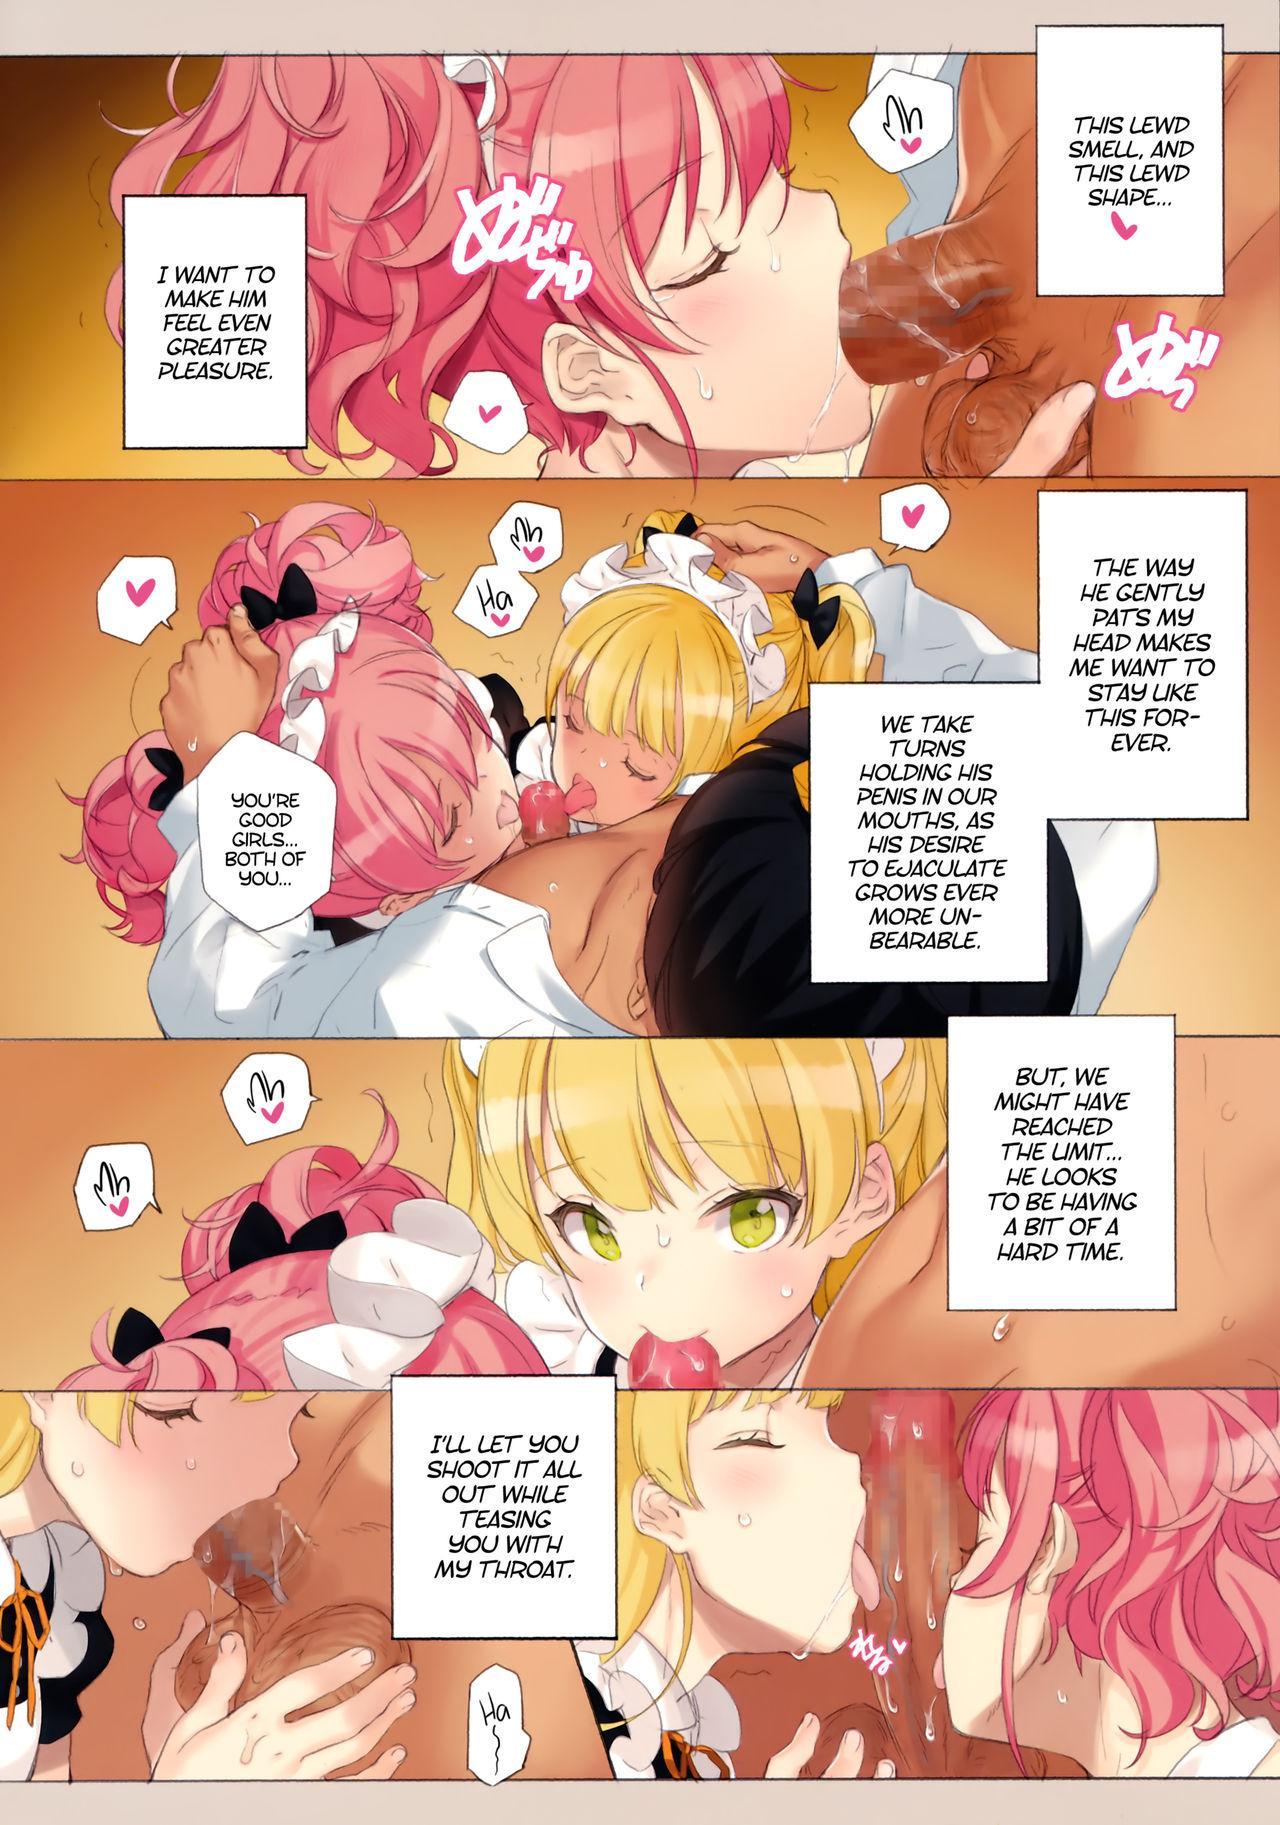 ORDER*MAID*SISTERS Jougasaki Shimai to Maid SEX Suru Hon   ORDER*MAID*SISTERS - A book about having maid sex with the Jougasaki Sisters 8